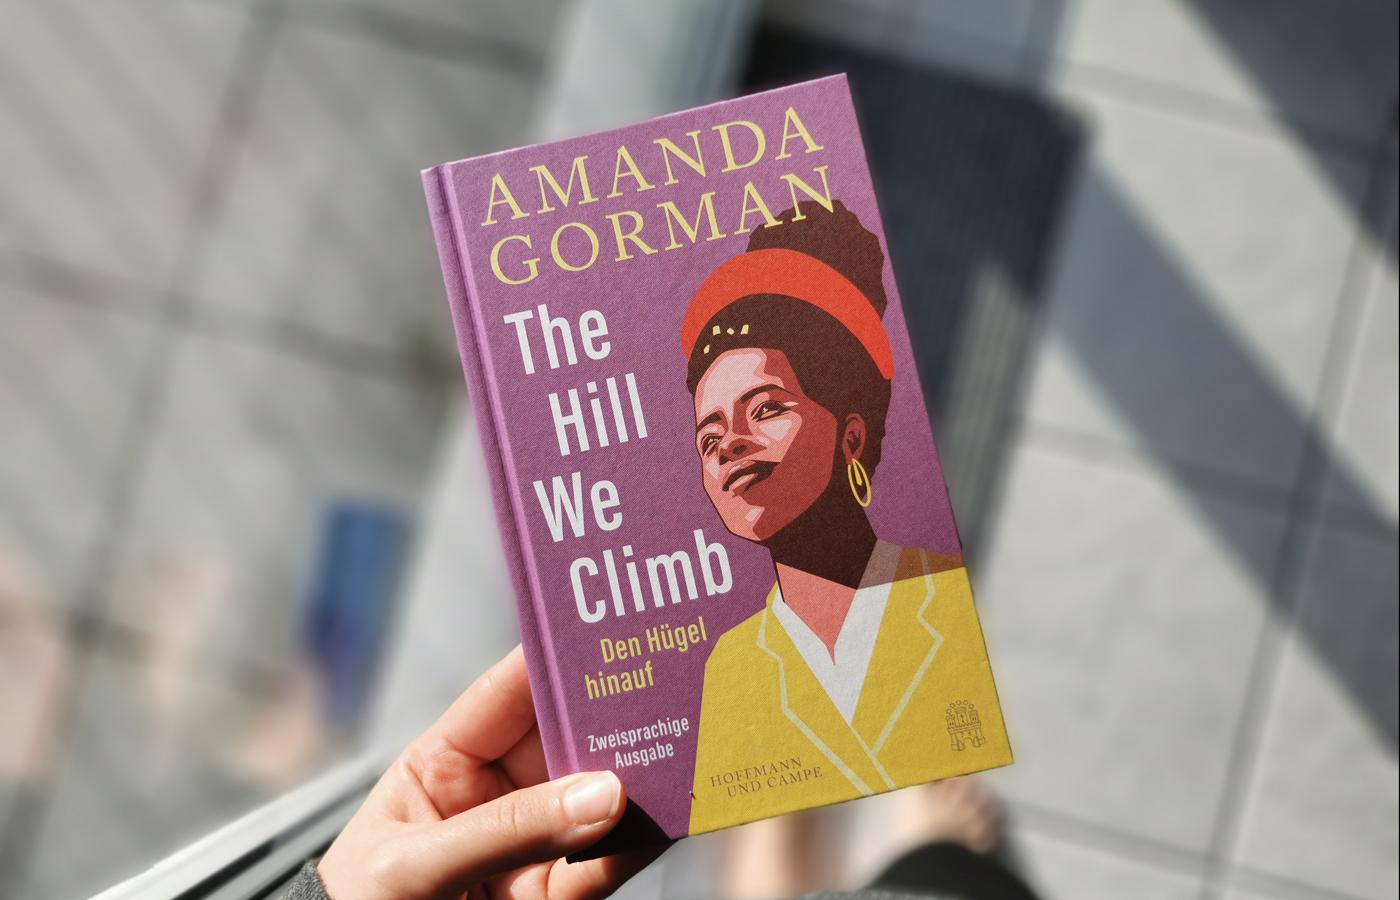 »The Hill We Climb – Den Hügel hinauf«  von Amanda Gorman